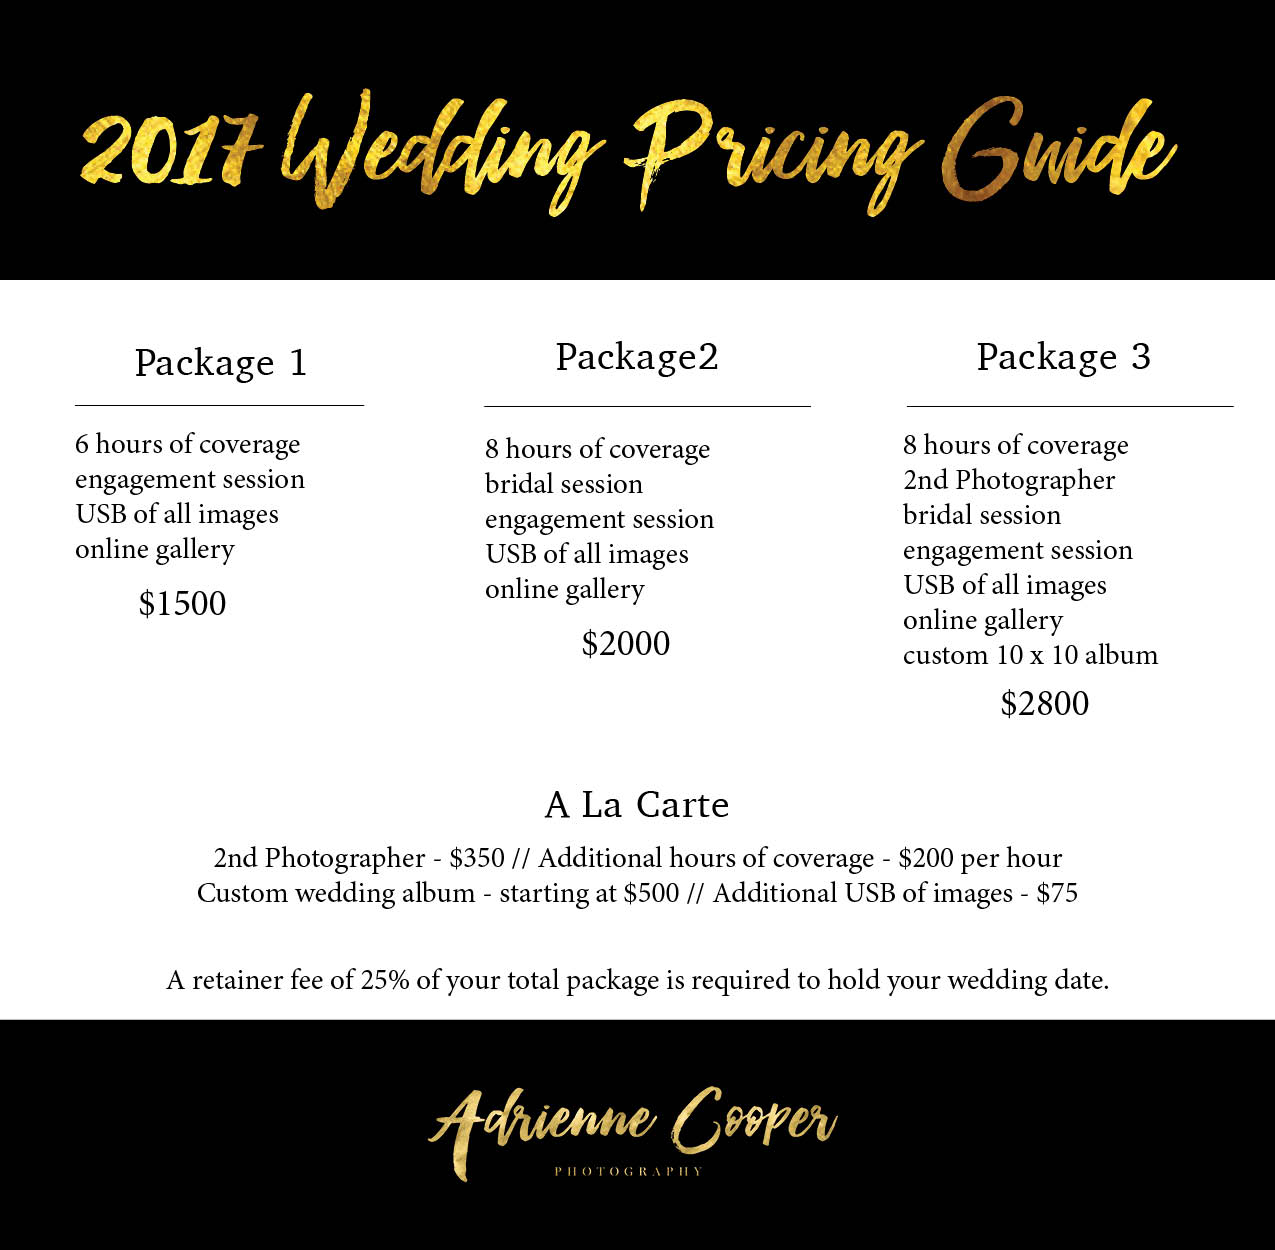 Wedding Pricing Guide-2017.jpg